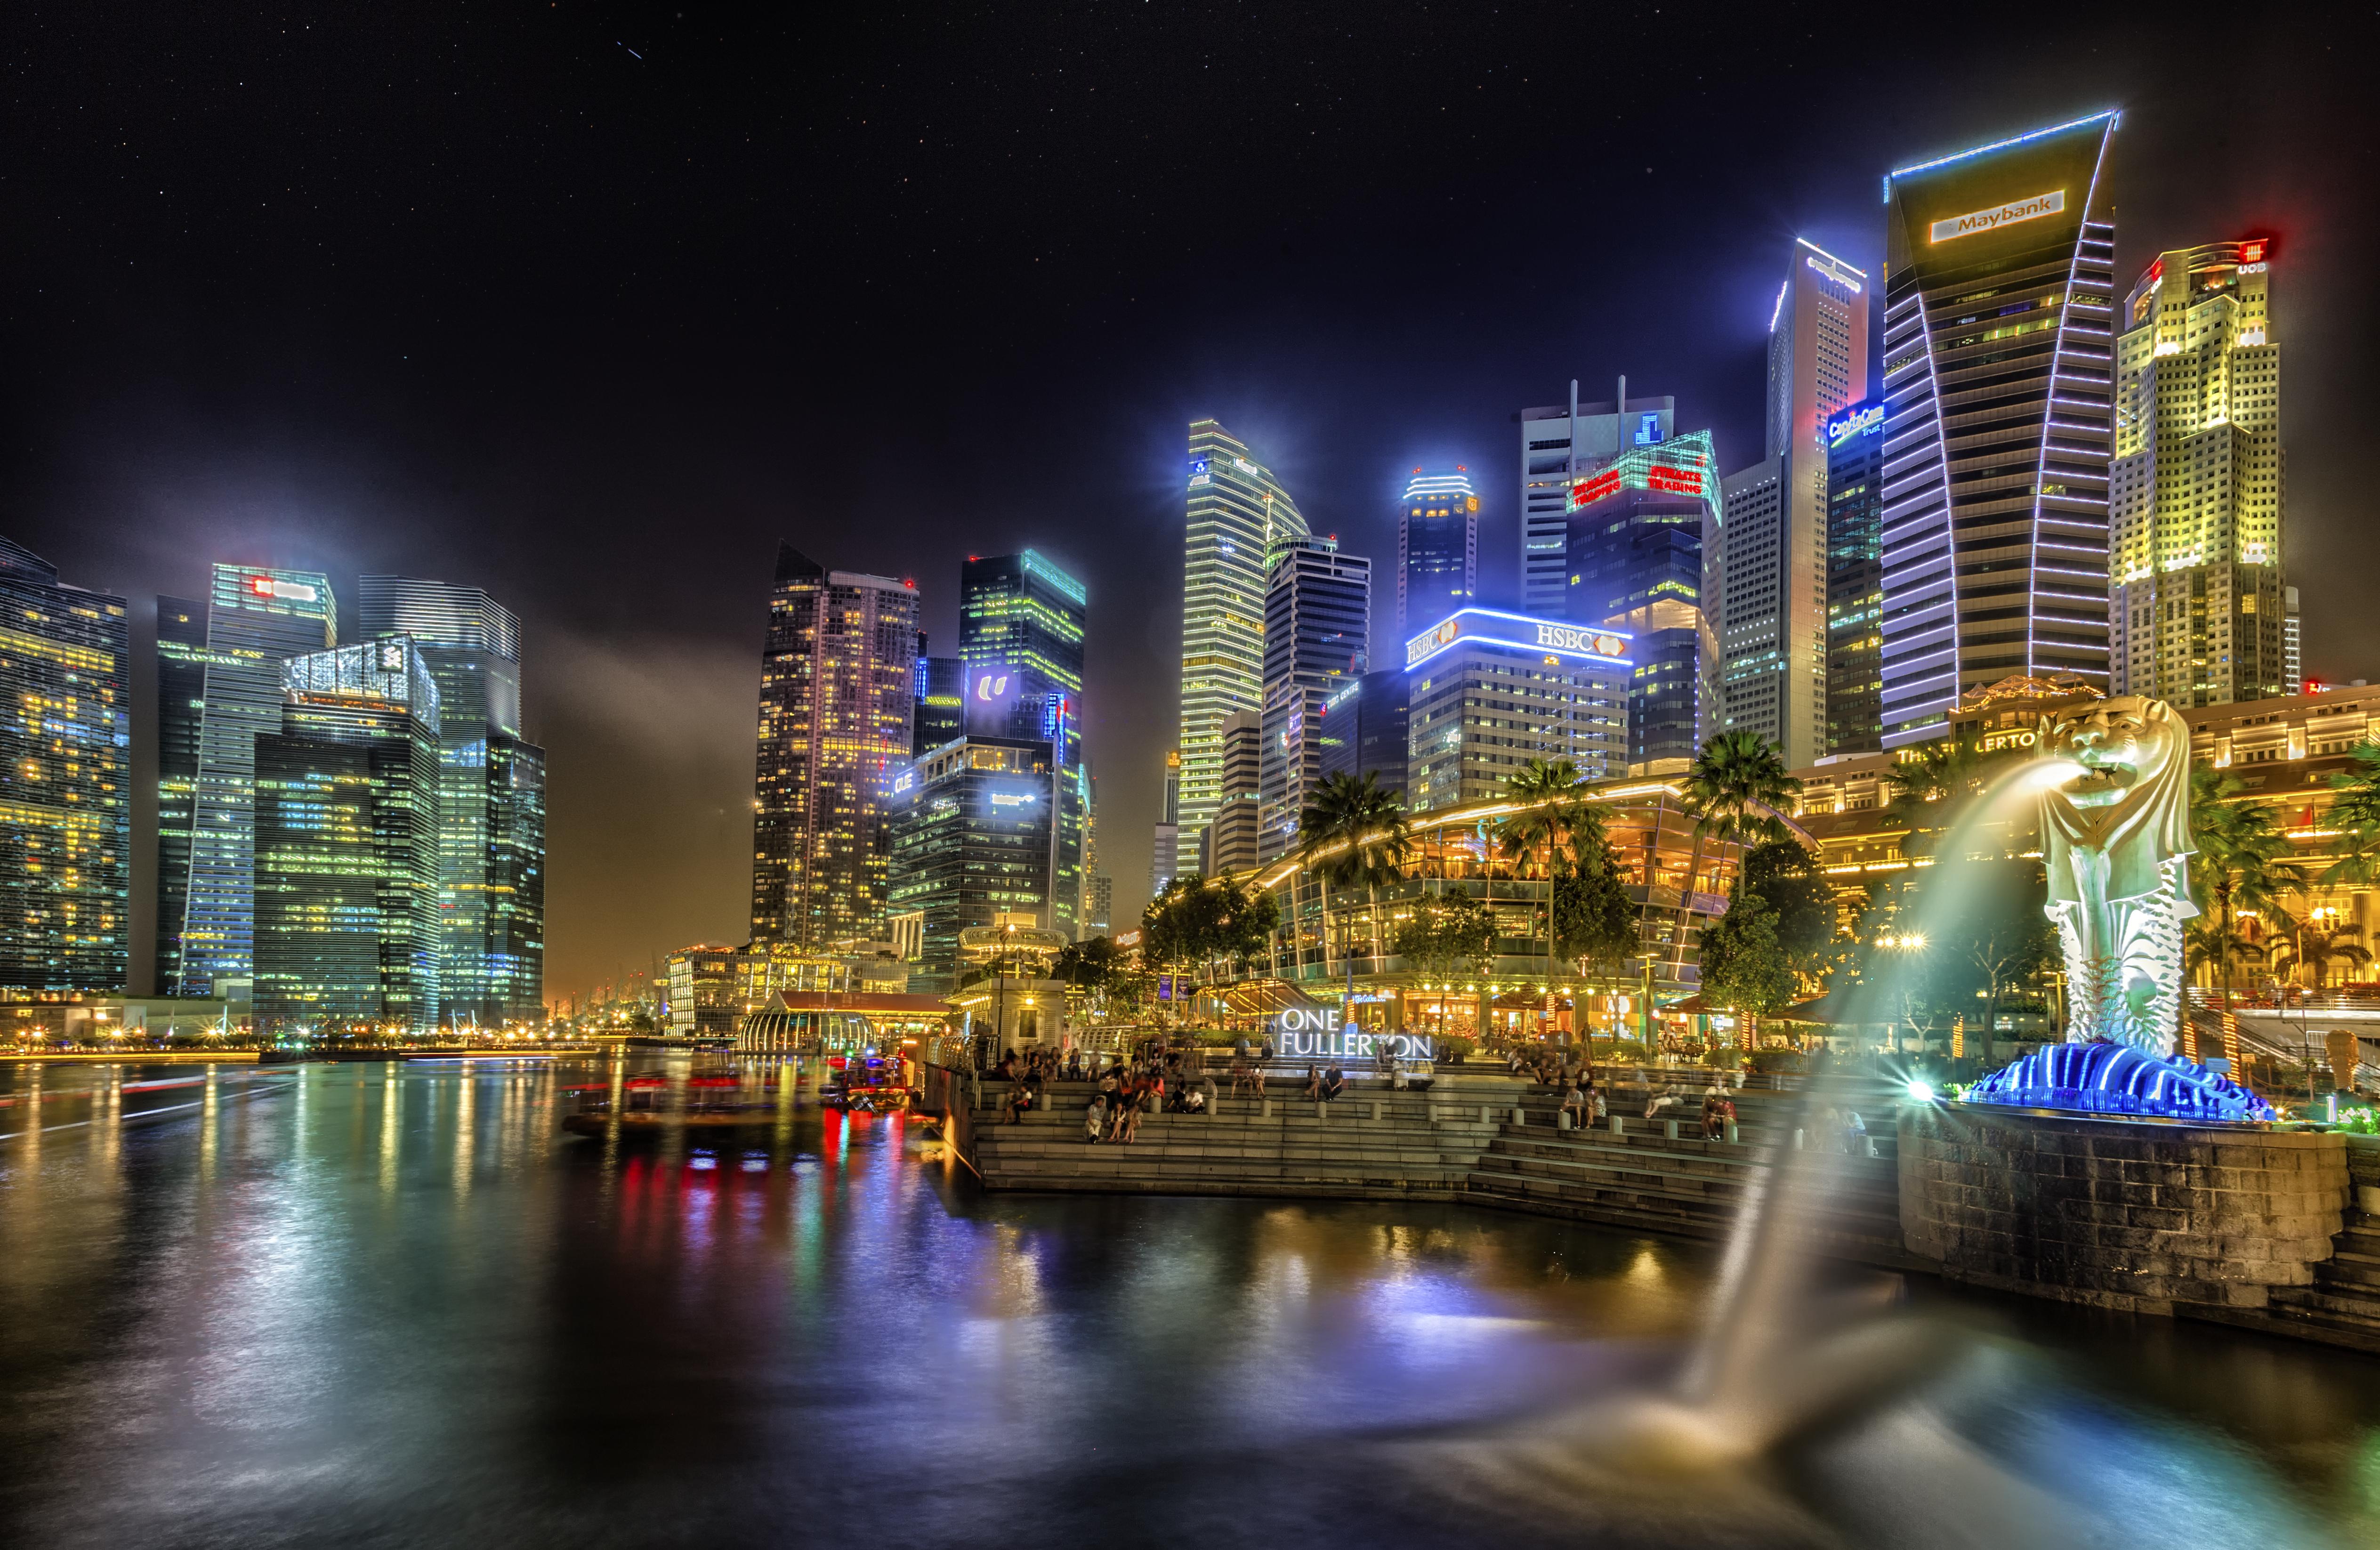 страны архитектура Сингапур ночь  № 1476106 бесплатно